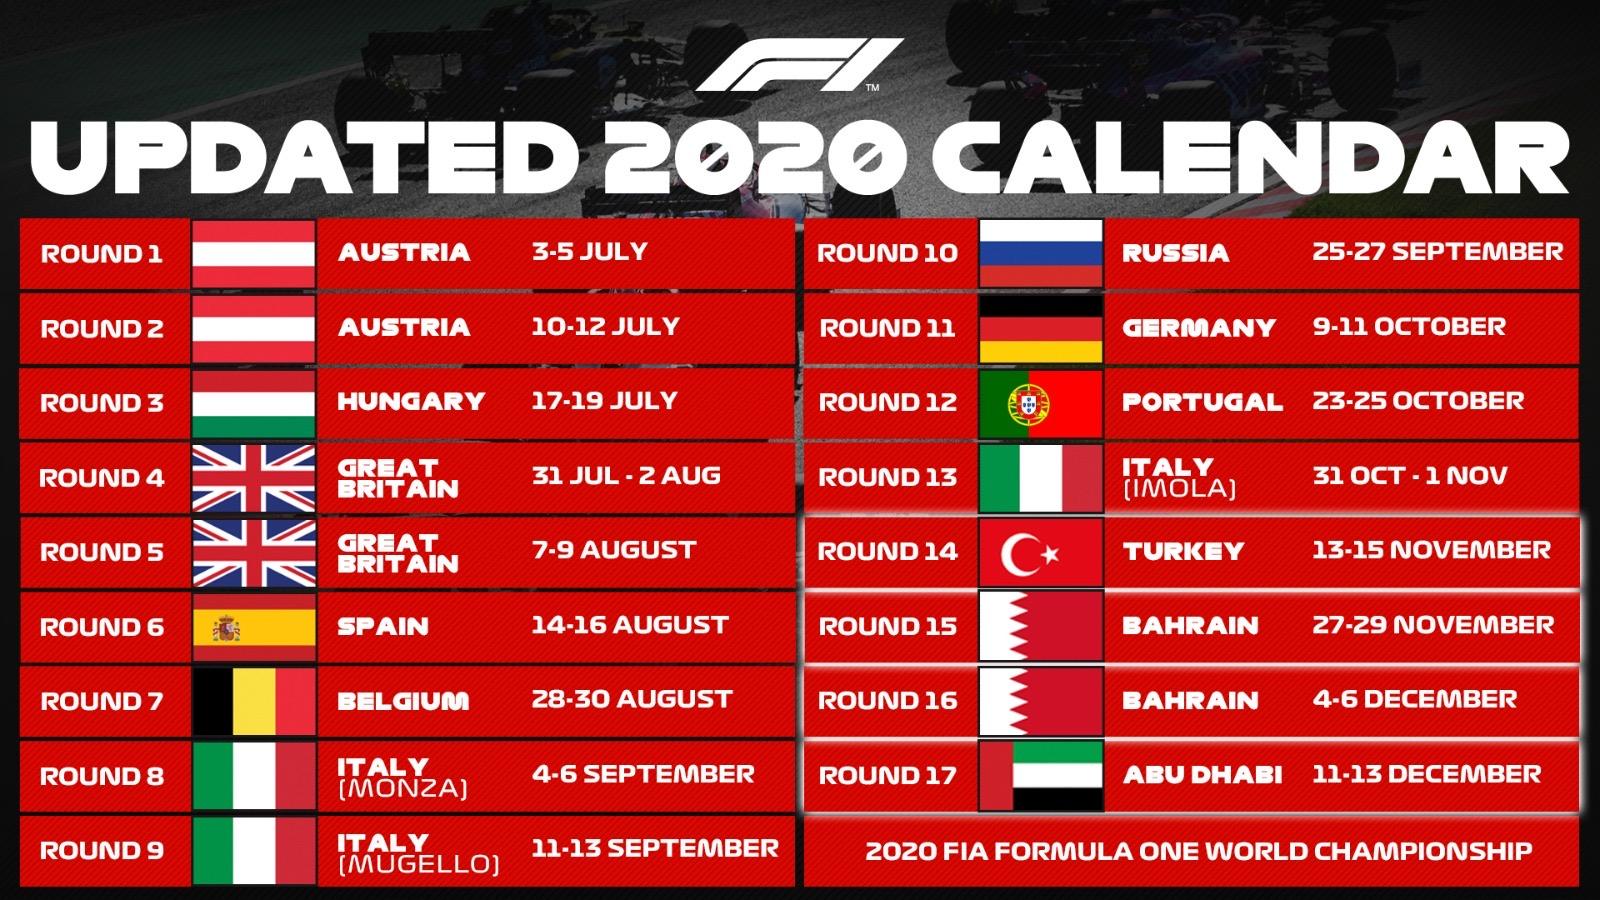 F1 2020 calendar footer.jpg